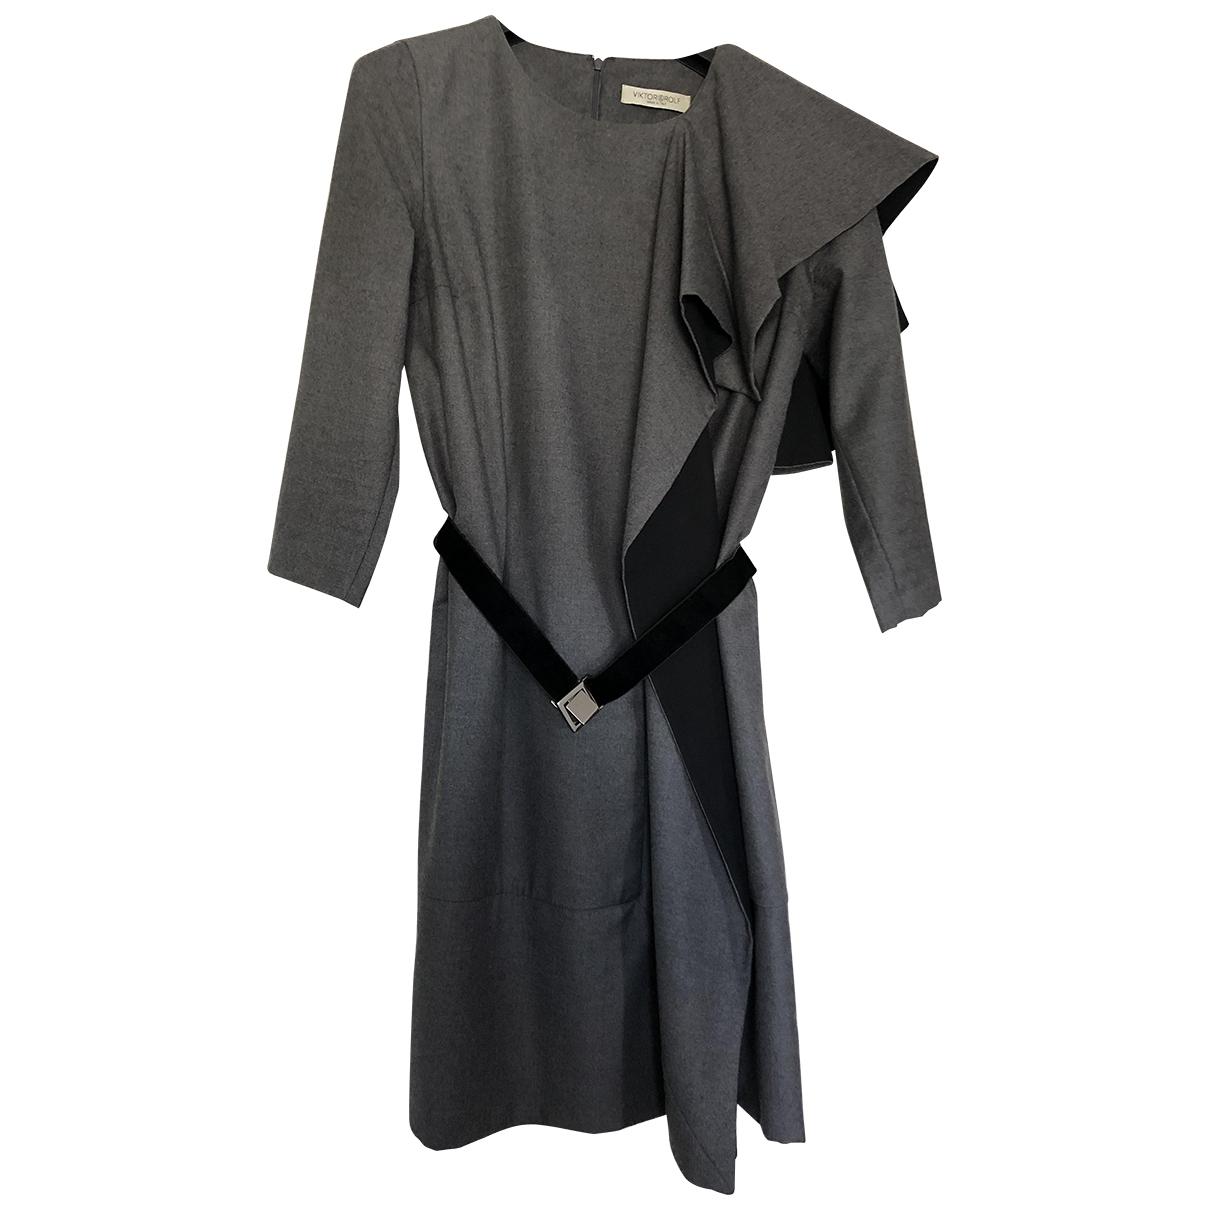 Viktor & Rolf - Robe   pour femme en laine - gris